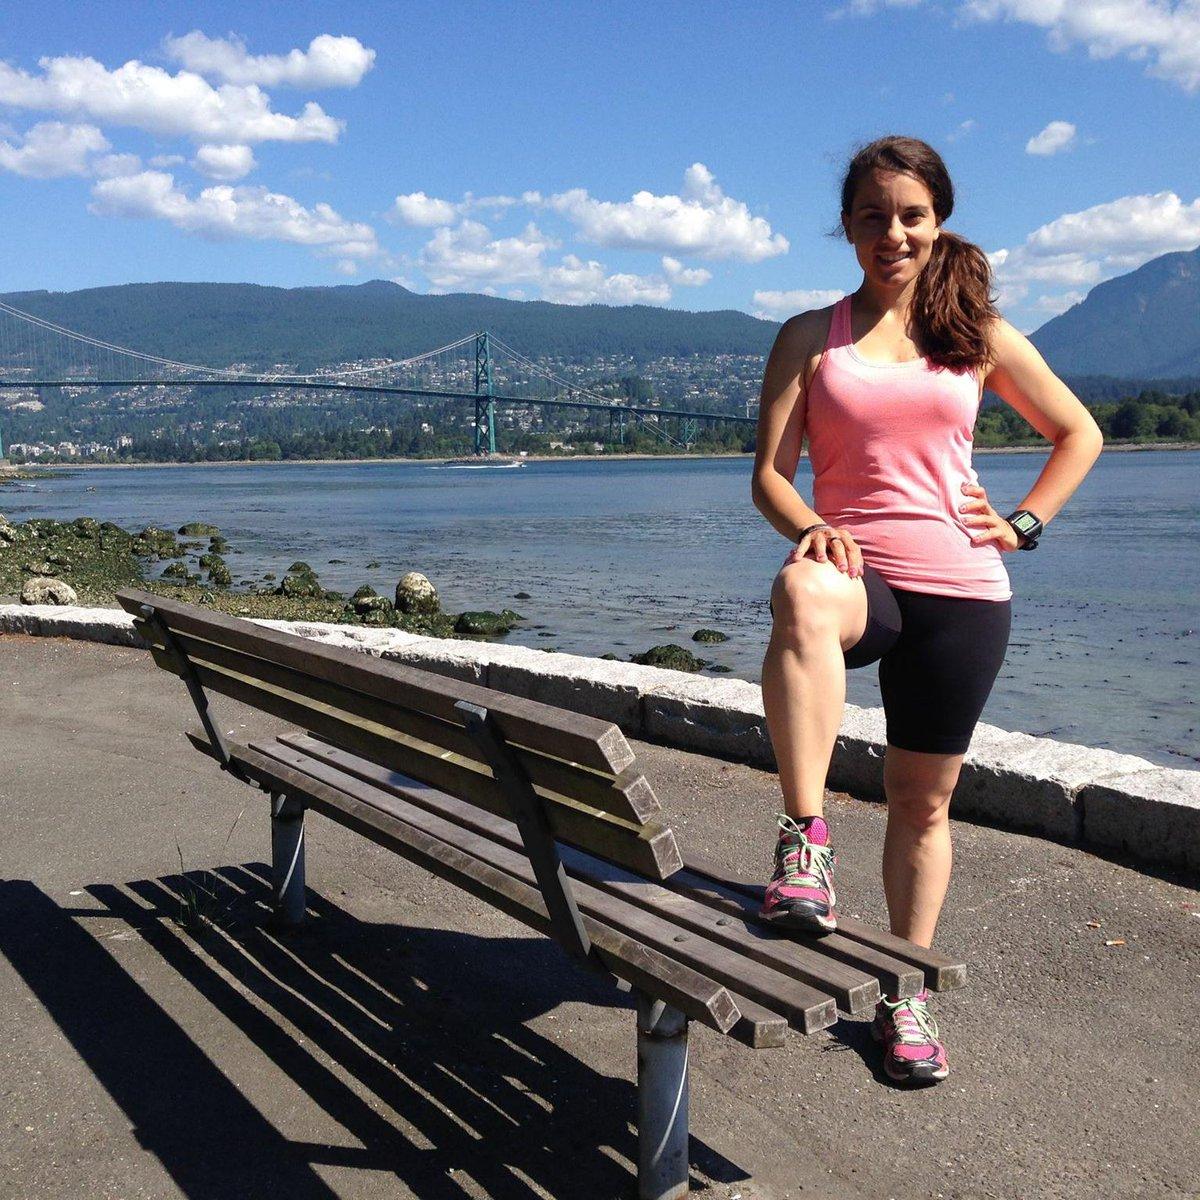 Running is good for your mental health: @jennapettinato's story. #LetsTalk https://t.co/uTQqmM7aKM @Bell_LetsTalk https://t.co/UkpaKPcssa